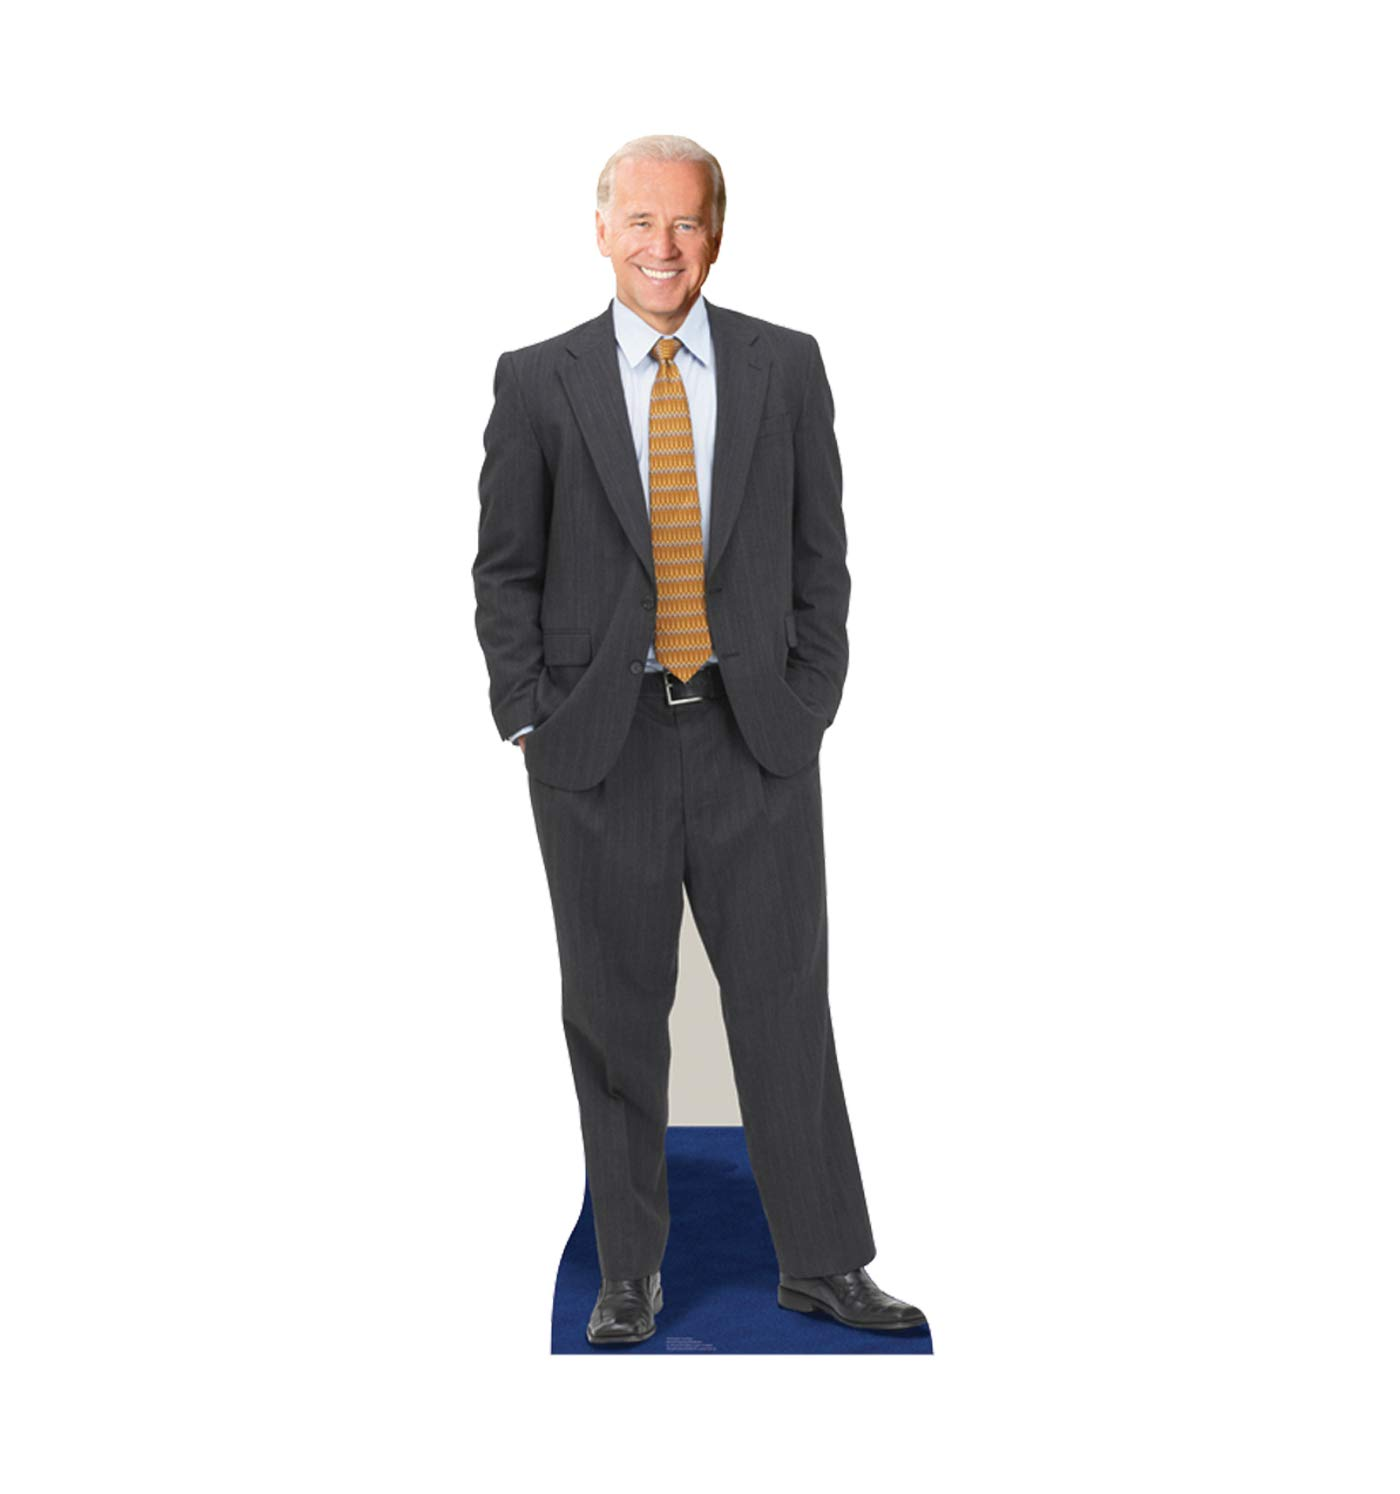 Advanced Graphics Vice President Joe Biden Life Size Cardboard Cutout Standup